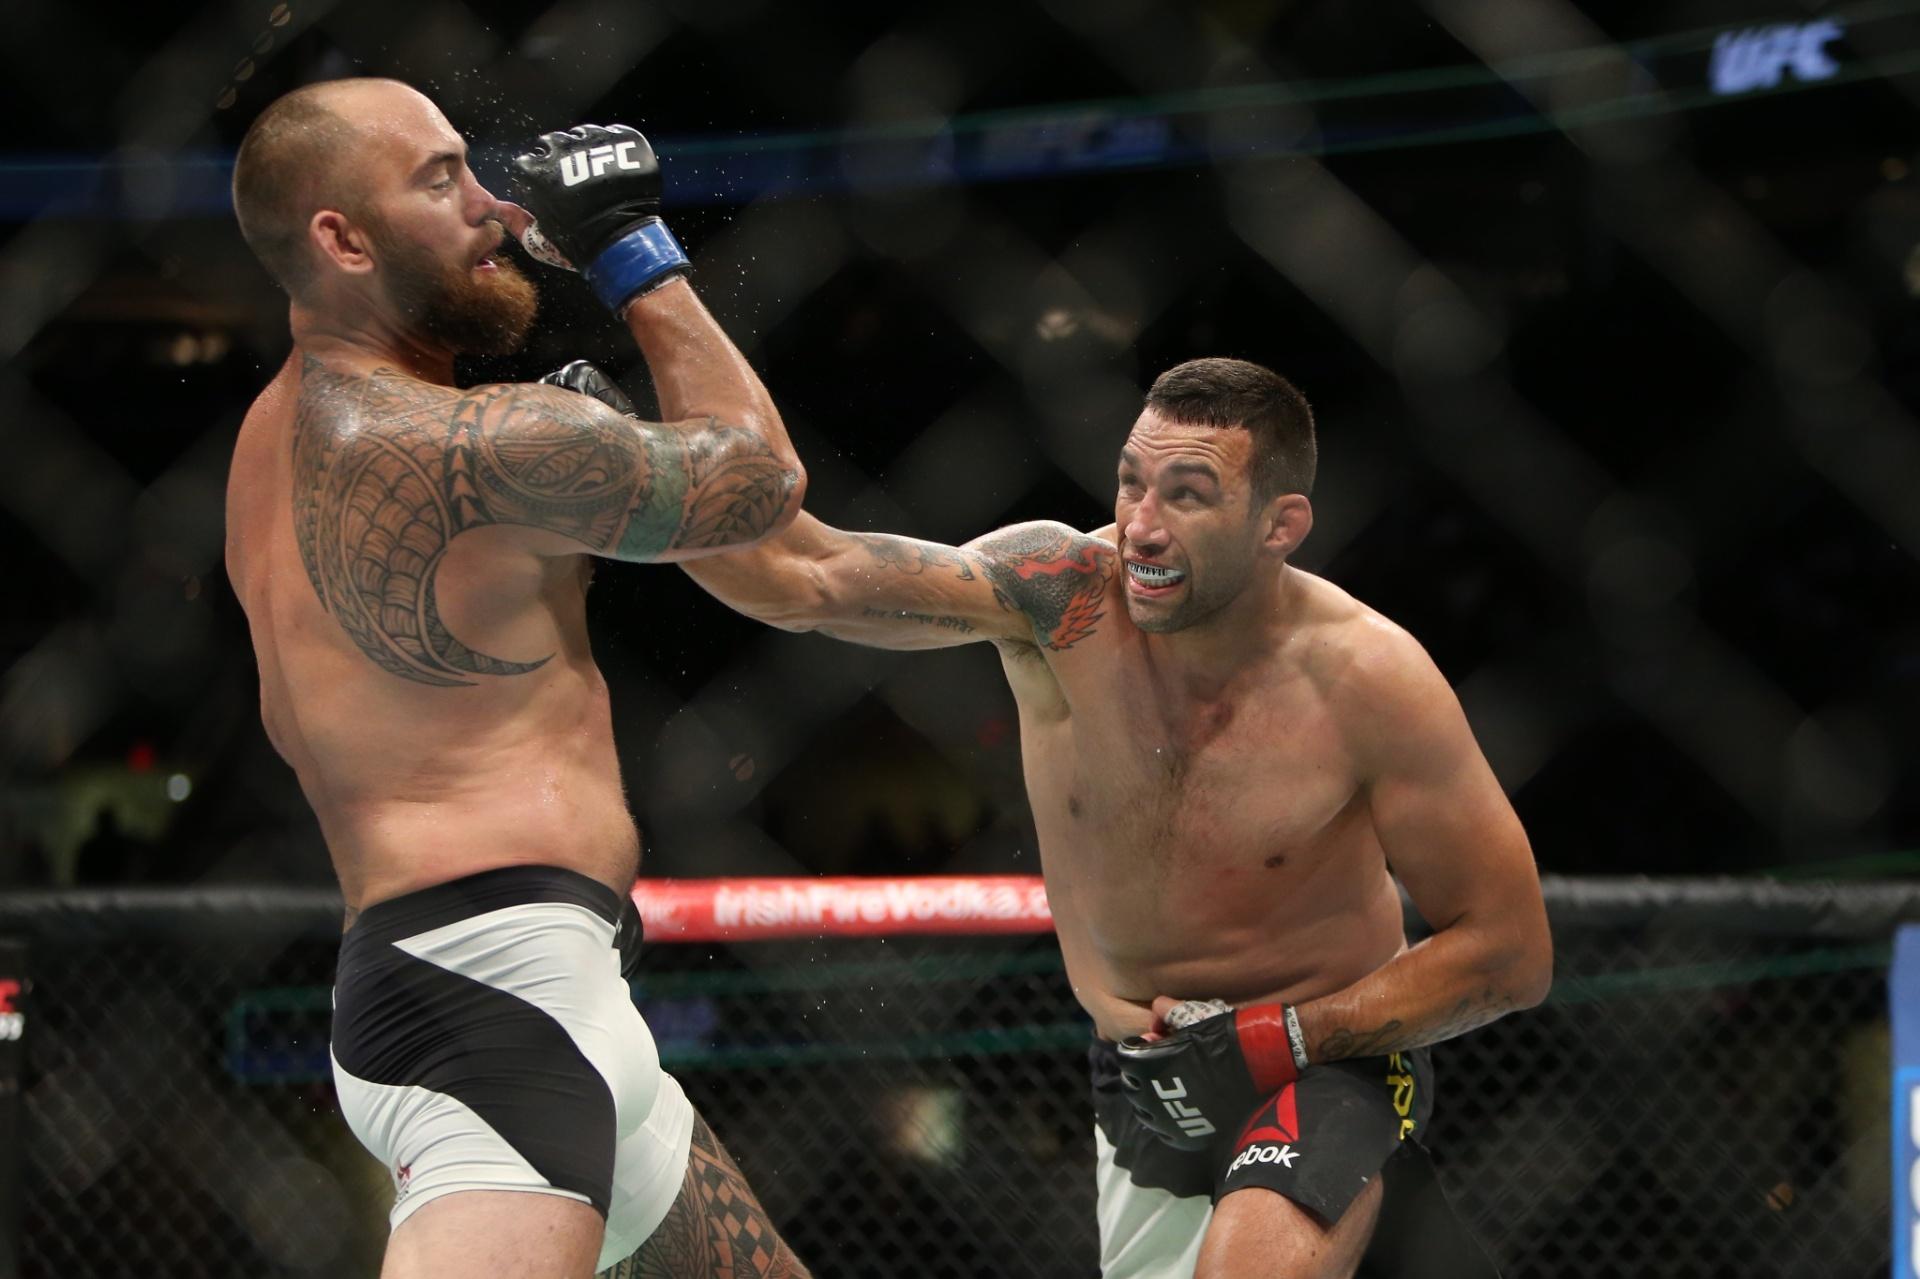 Werdum conecta soco em Travis Browne no UFC 203